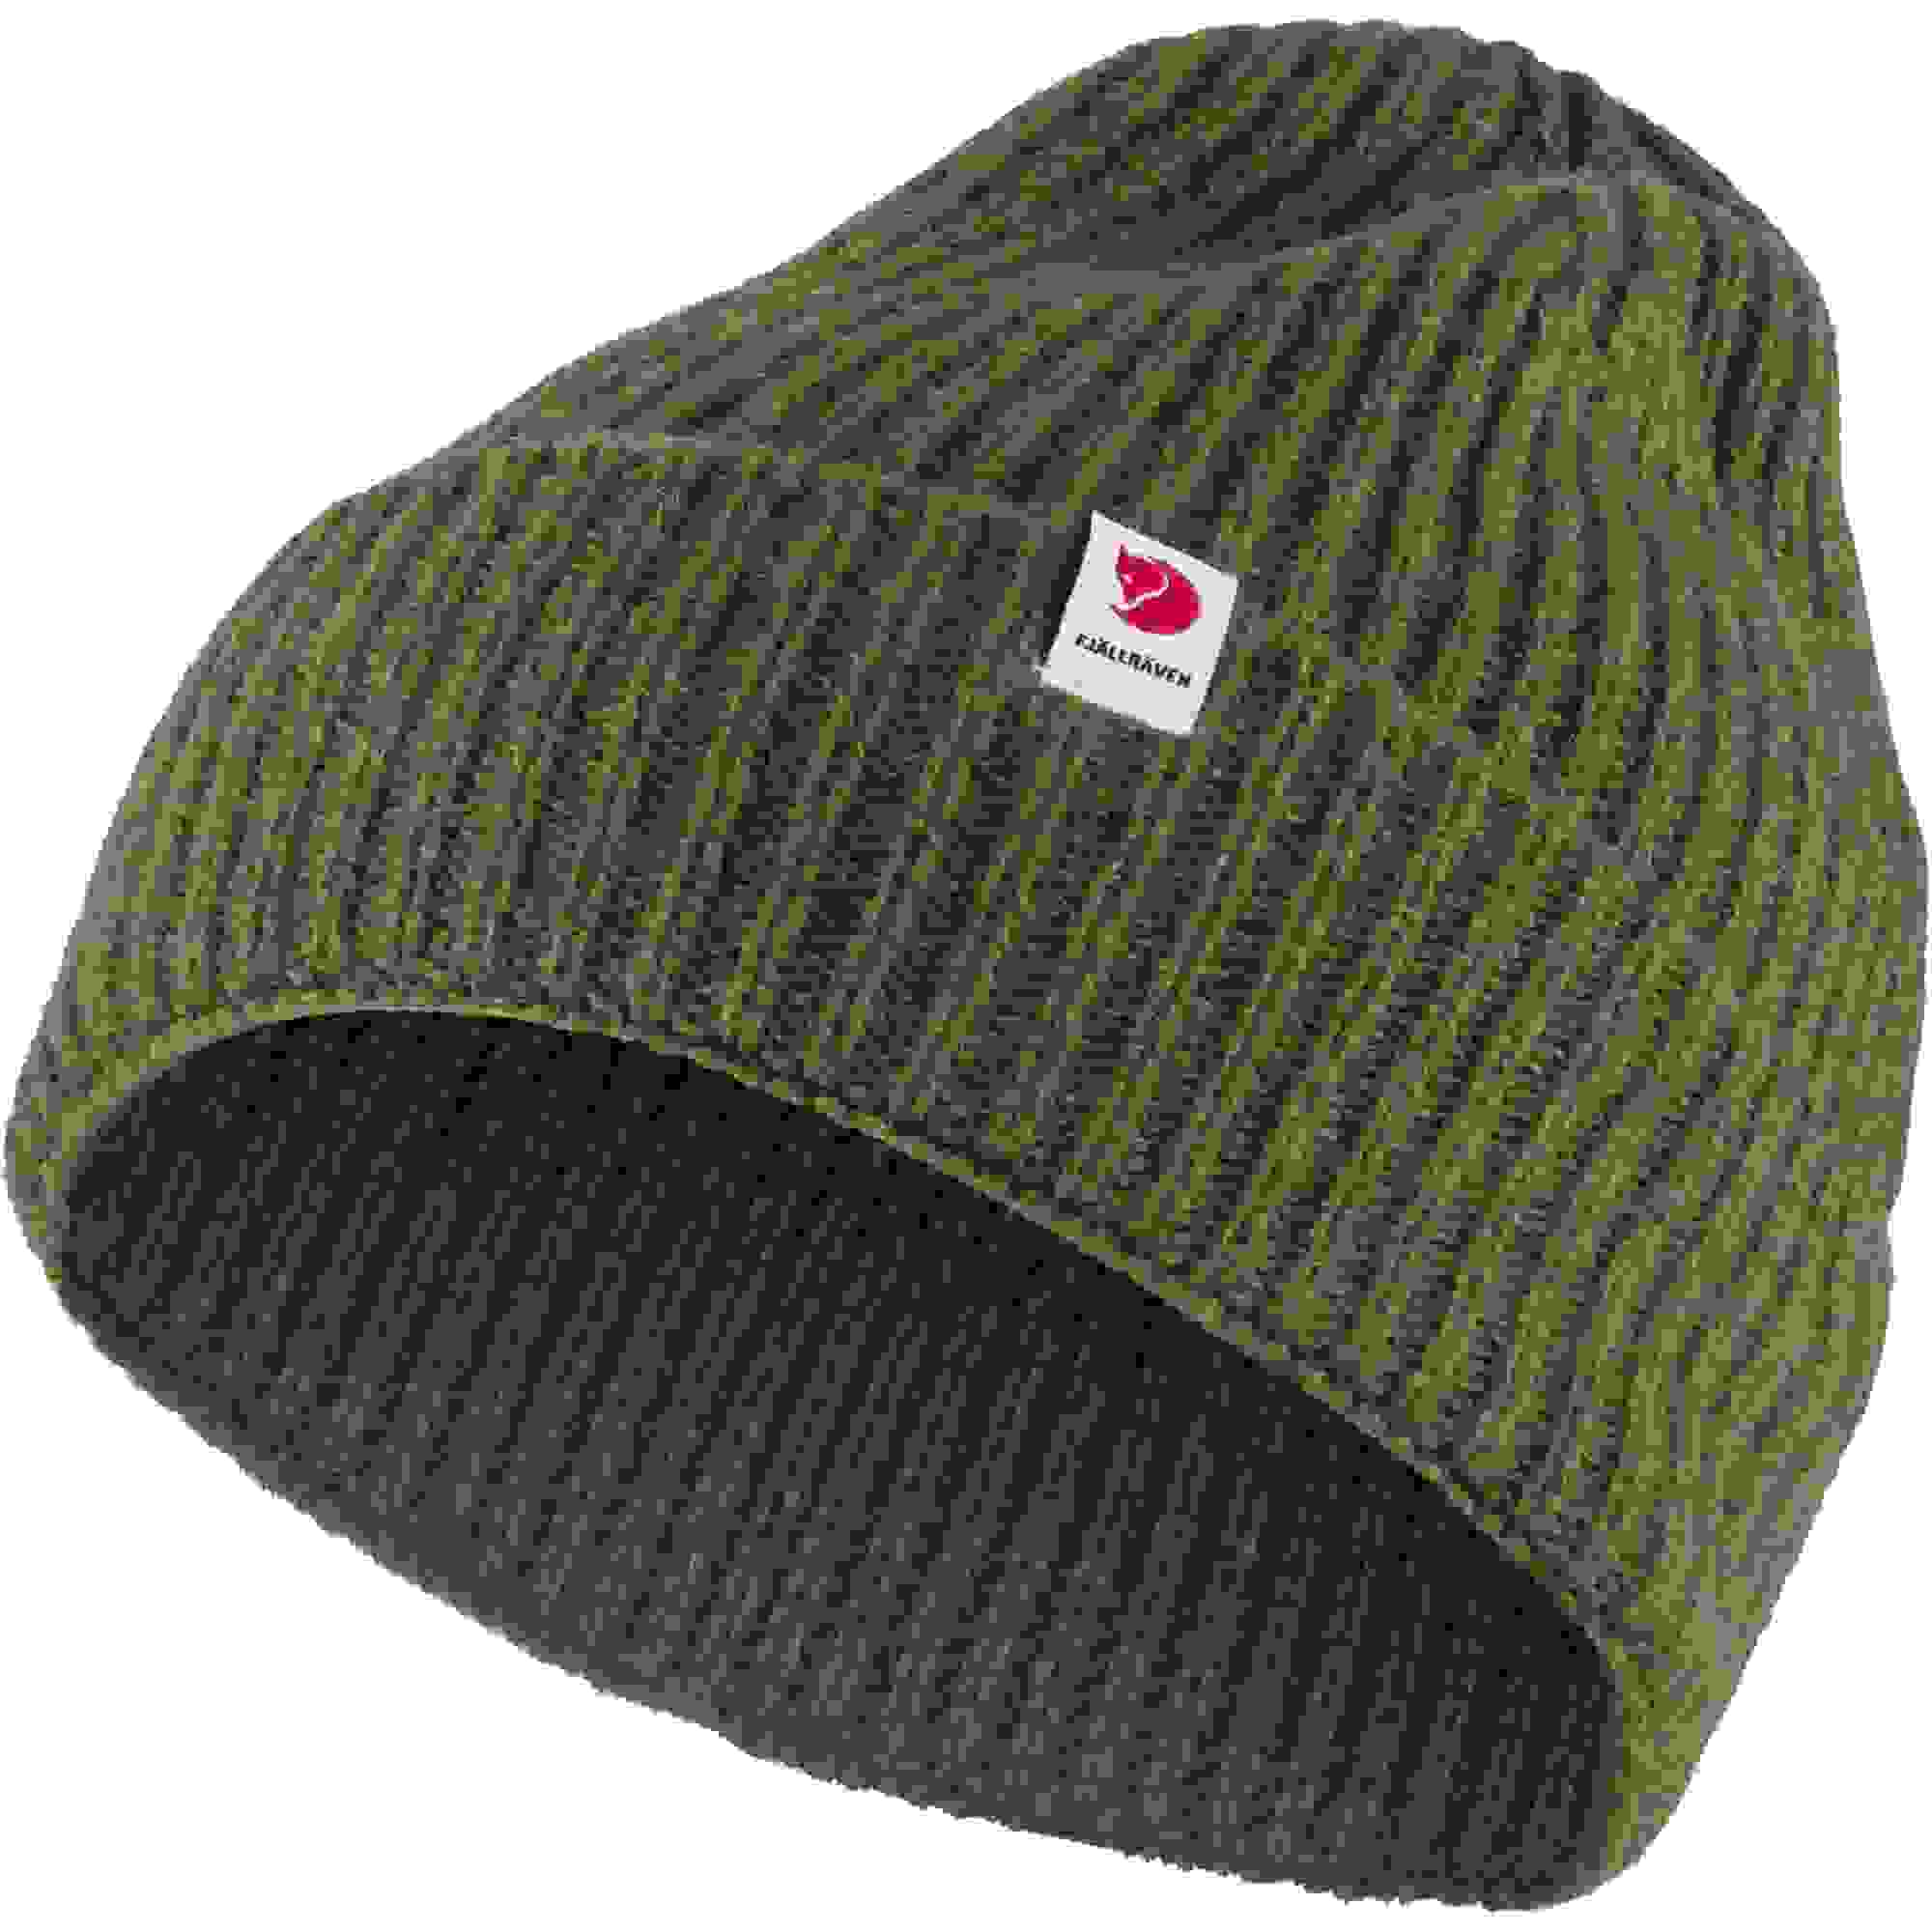 Adulto Fj/ällr/även Logo Tab Hat Berretto Unisex